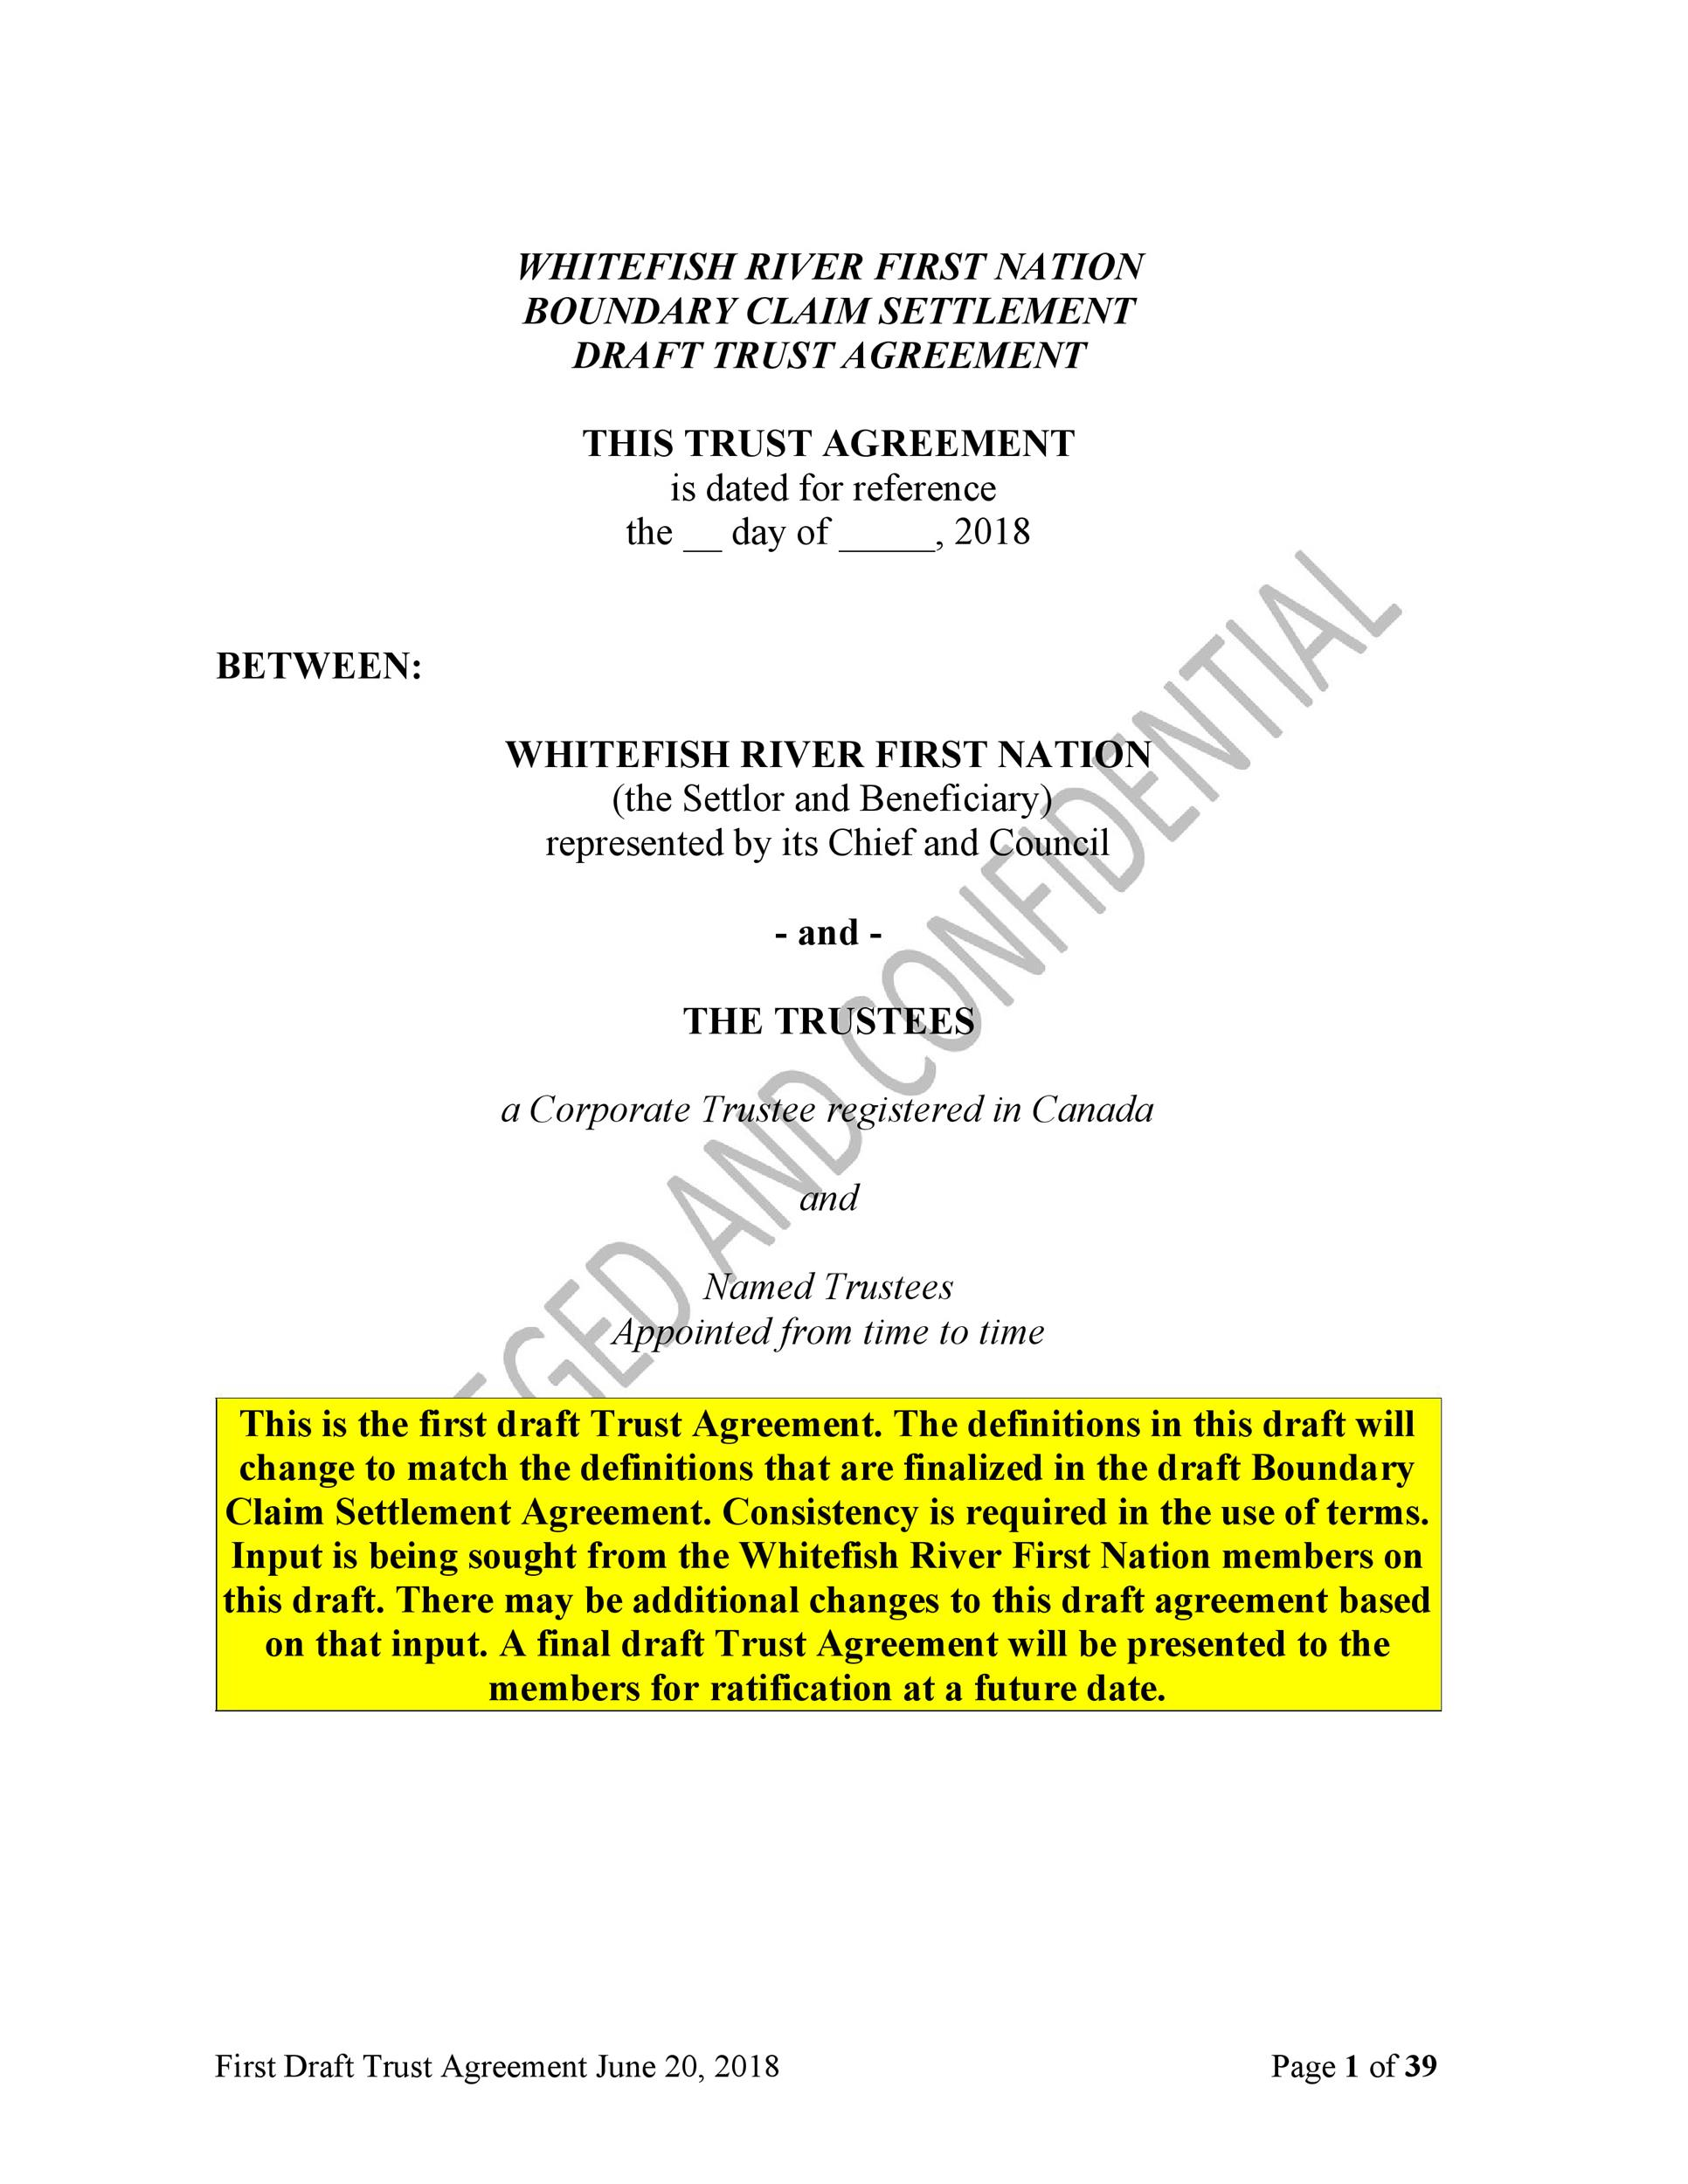 Free trust agreement 16